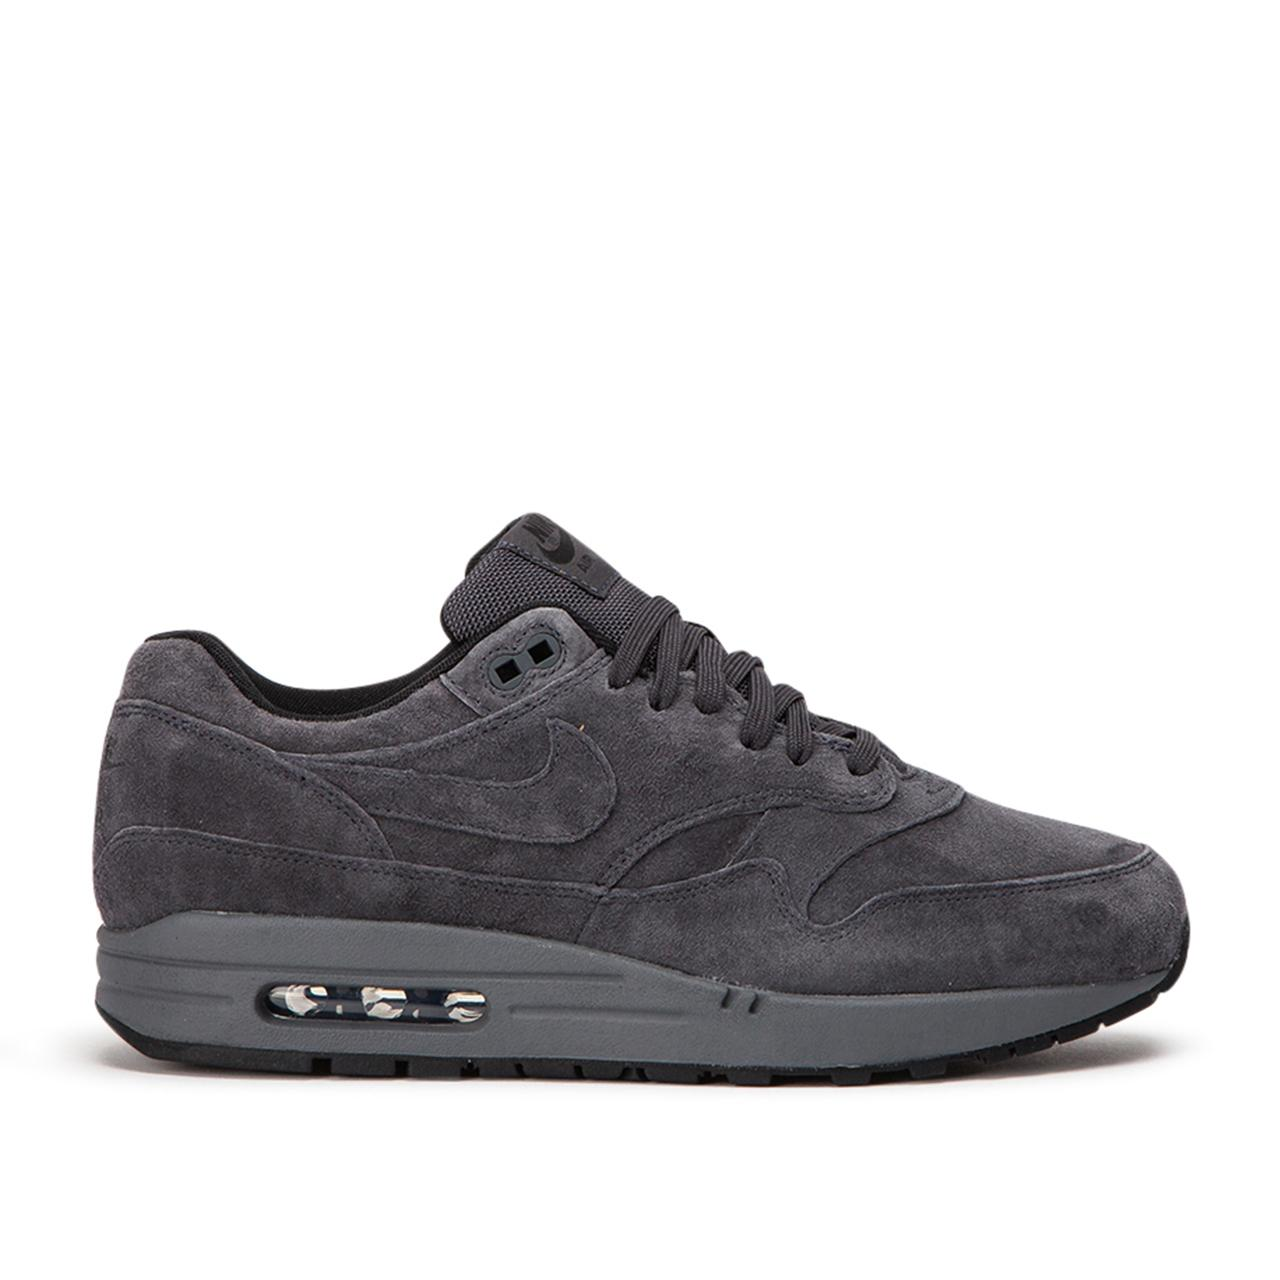 Nike Suede Nike Air Max 1 Premium in Grey (Gray) for Men - Lyst